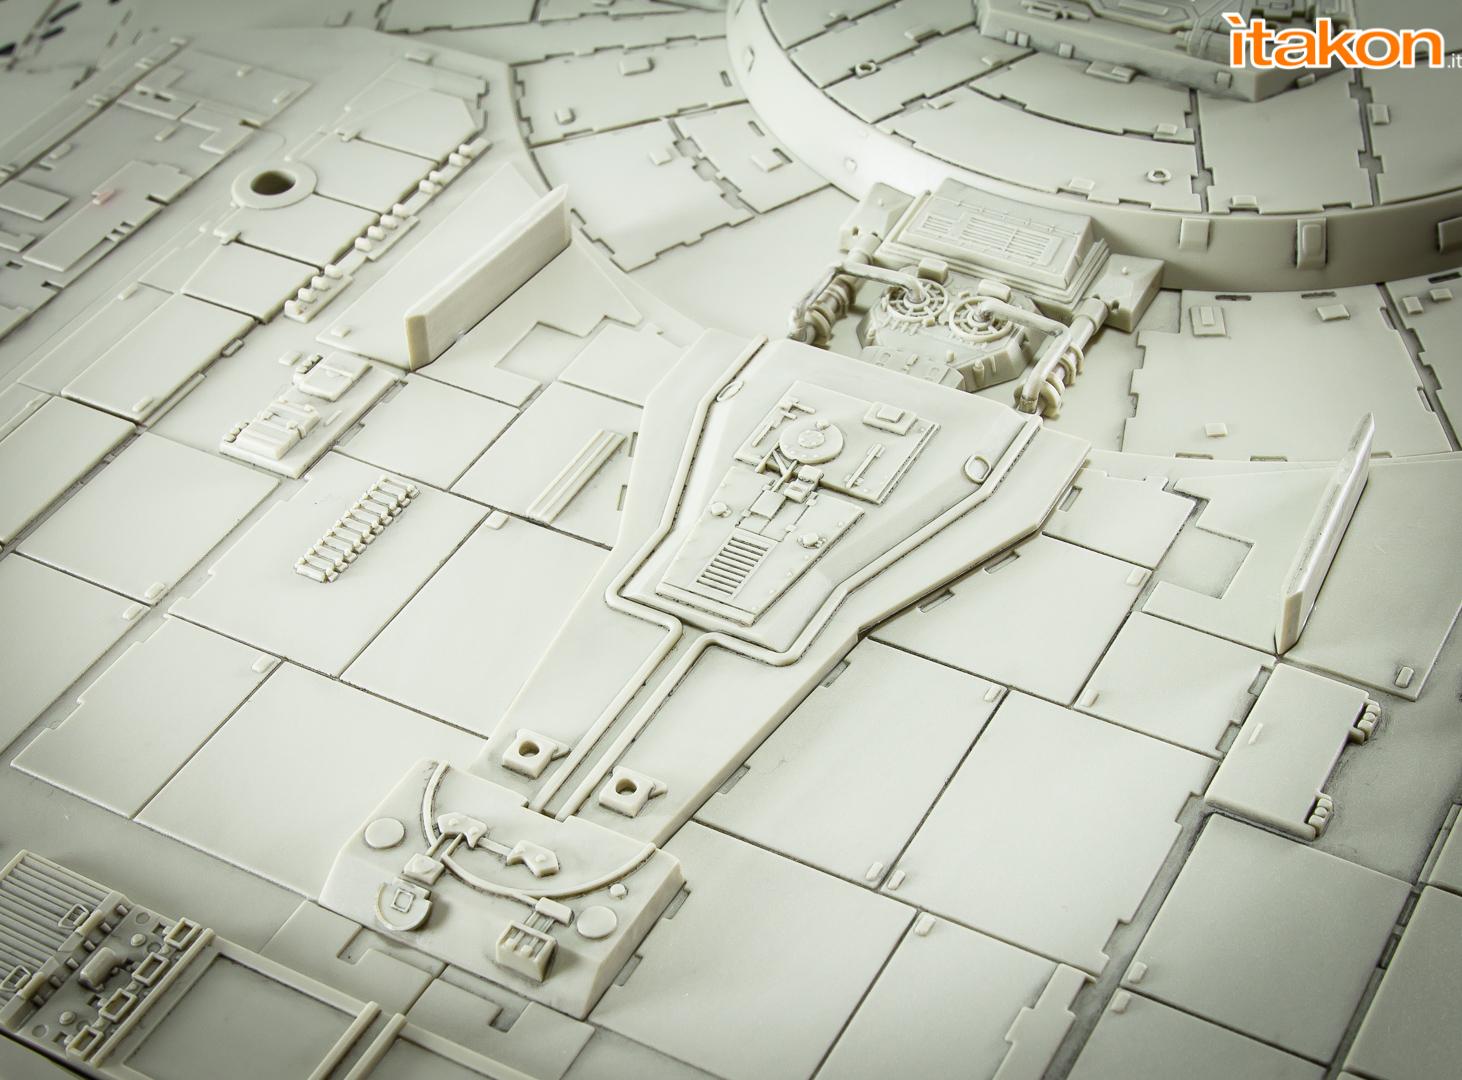 Link a De Agostini ModelSpace Millenniun Falcon Itakon _50